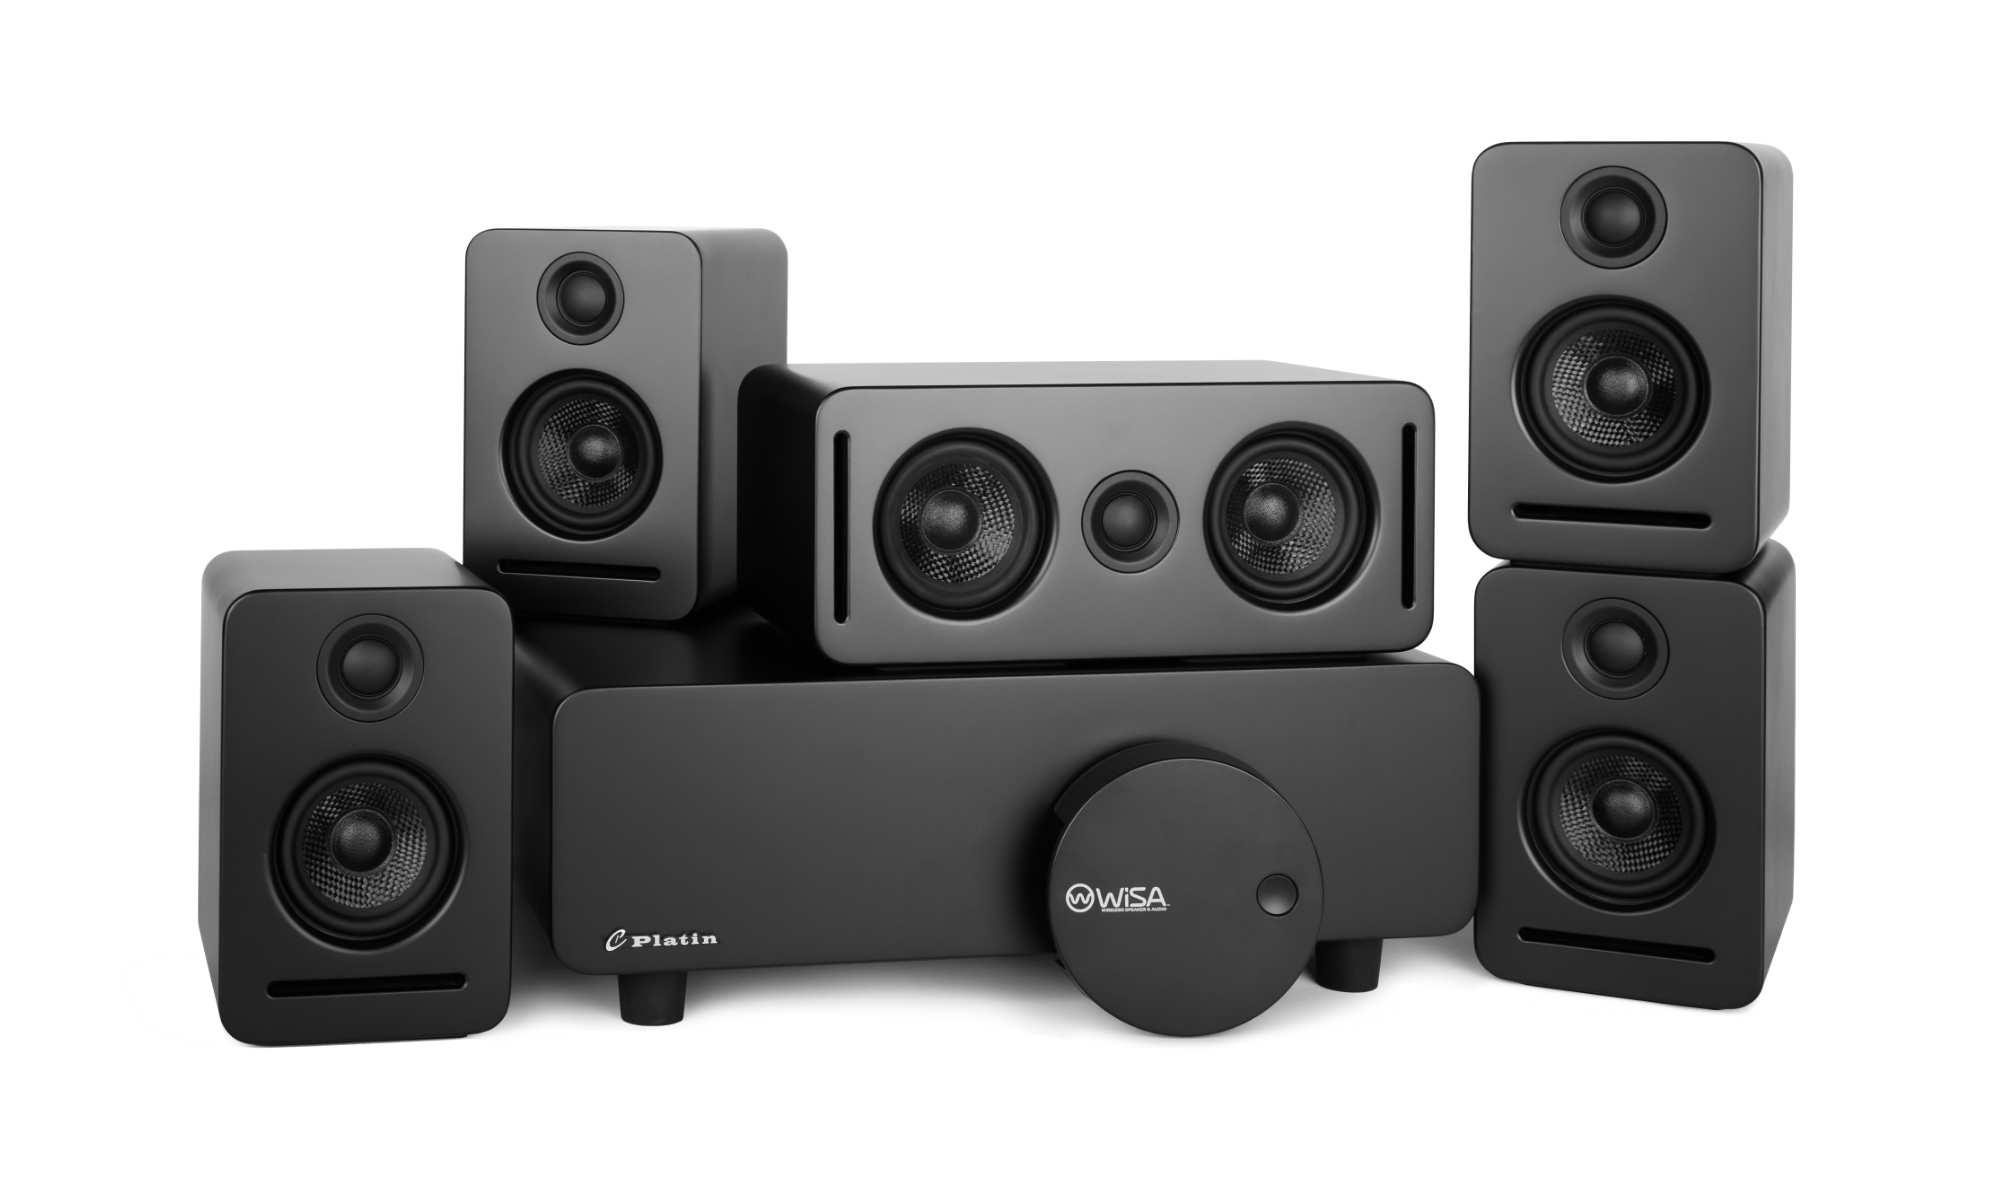 Monaco 5.1 speaker system with WiSA SoundSend Audio transmitter